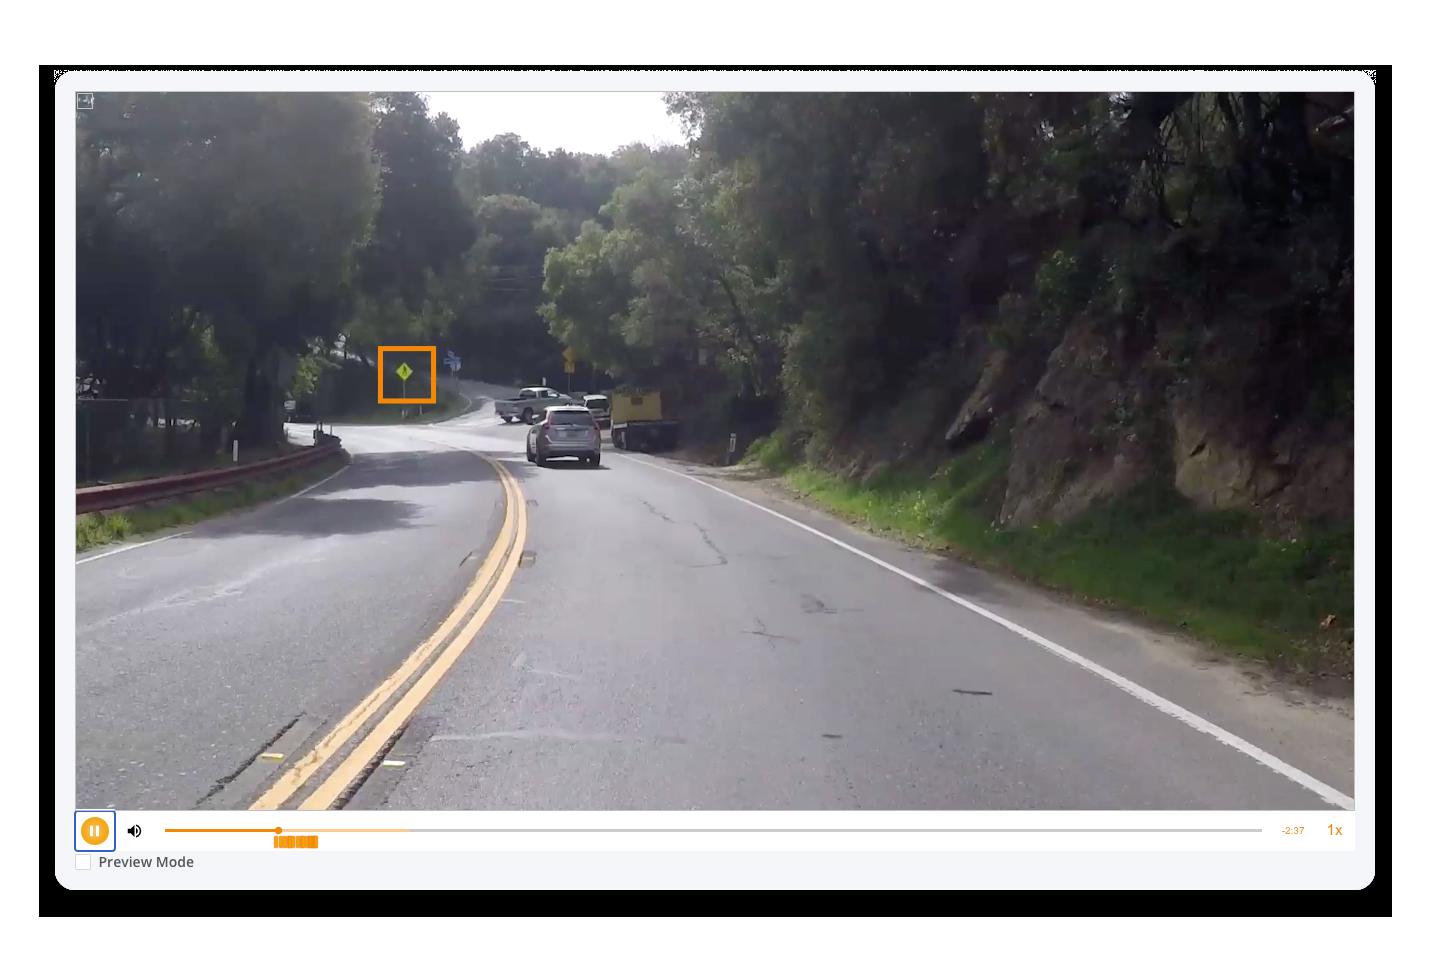 drive-focus-interpolation